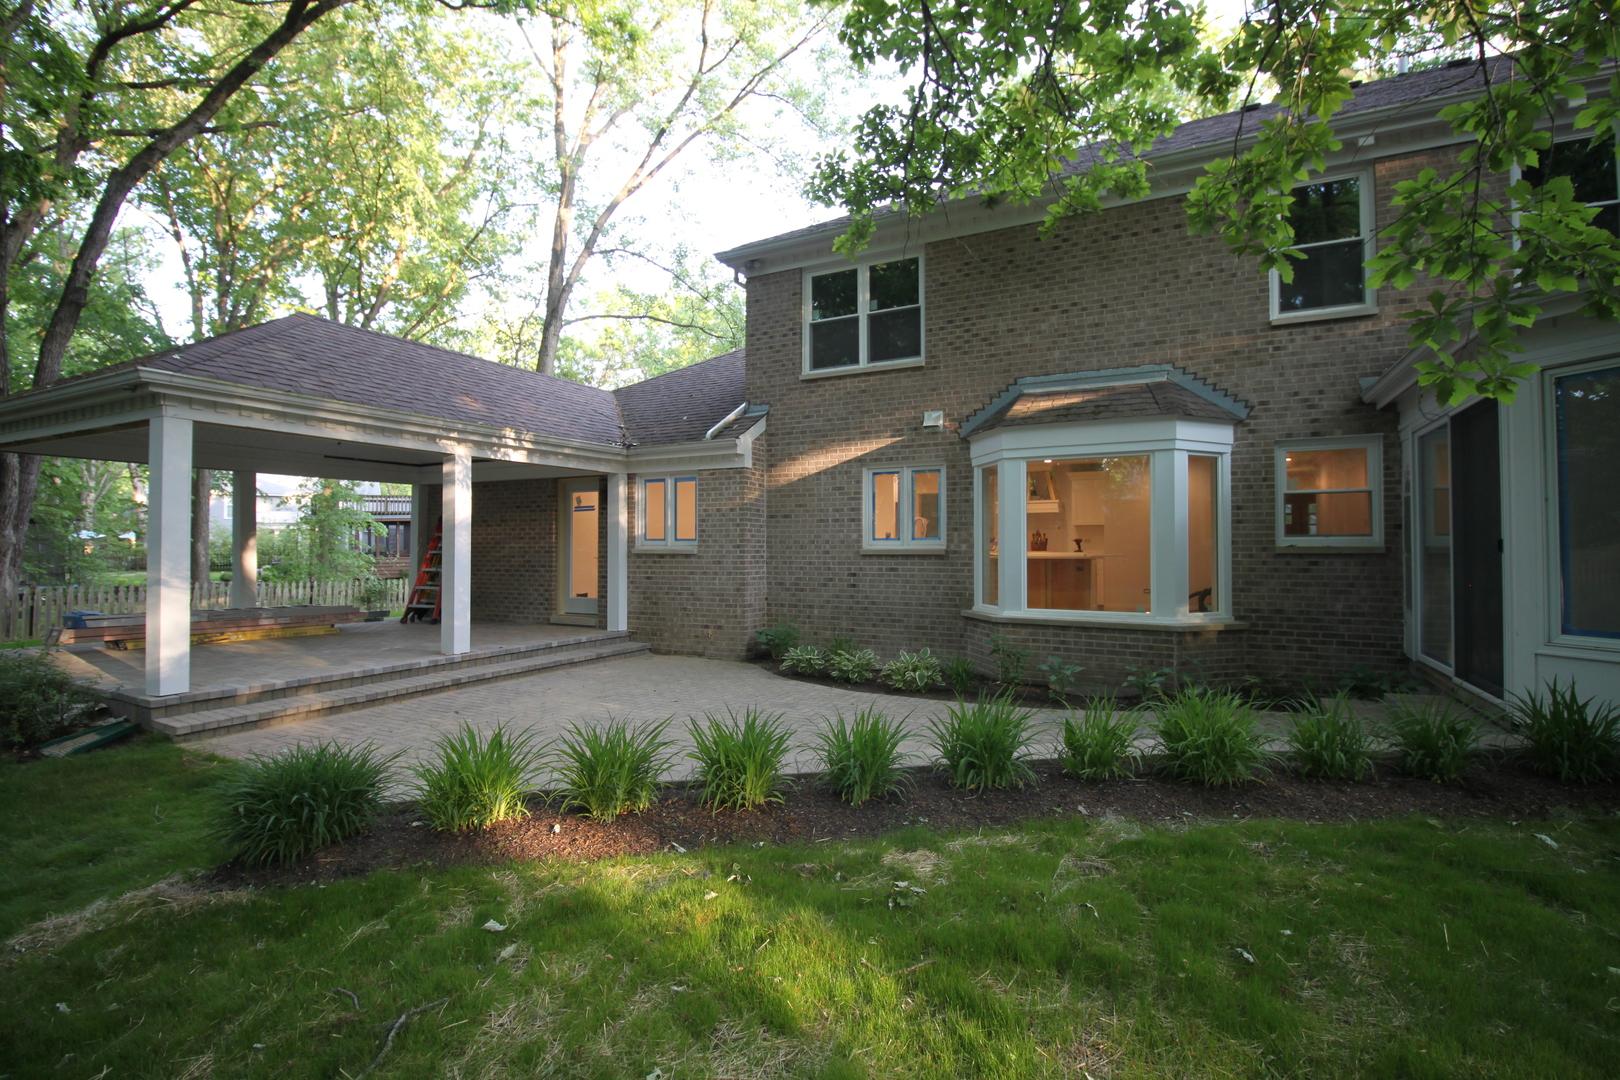 227 Surrey, Lake Forest, Illinois, 60045